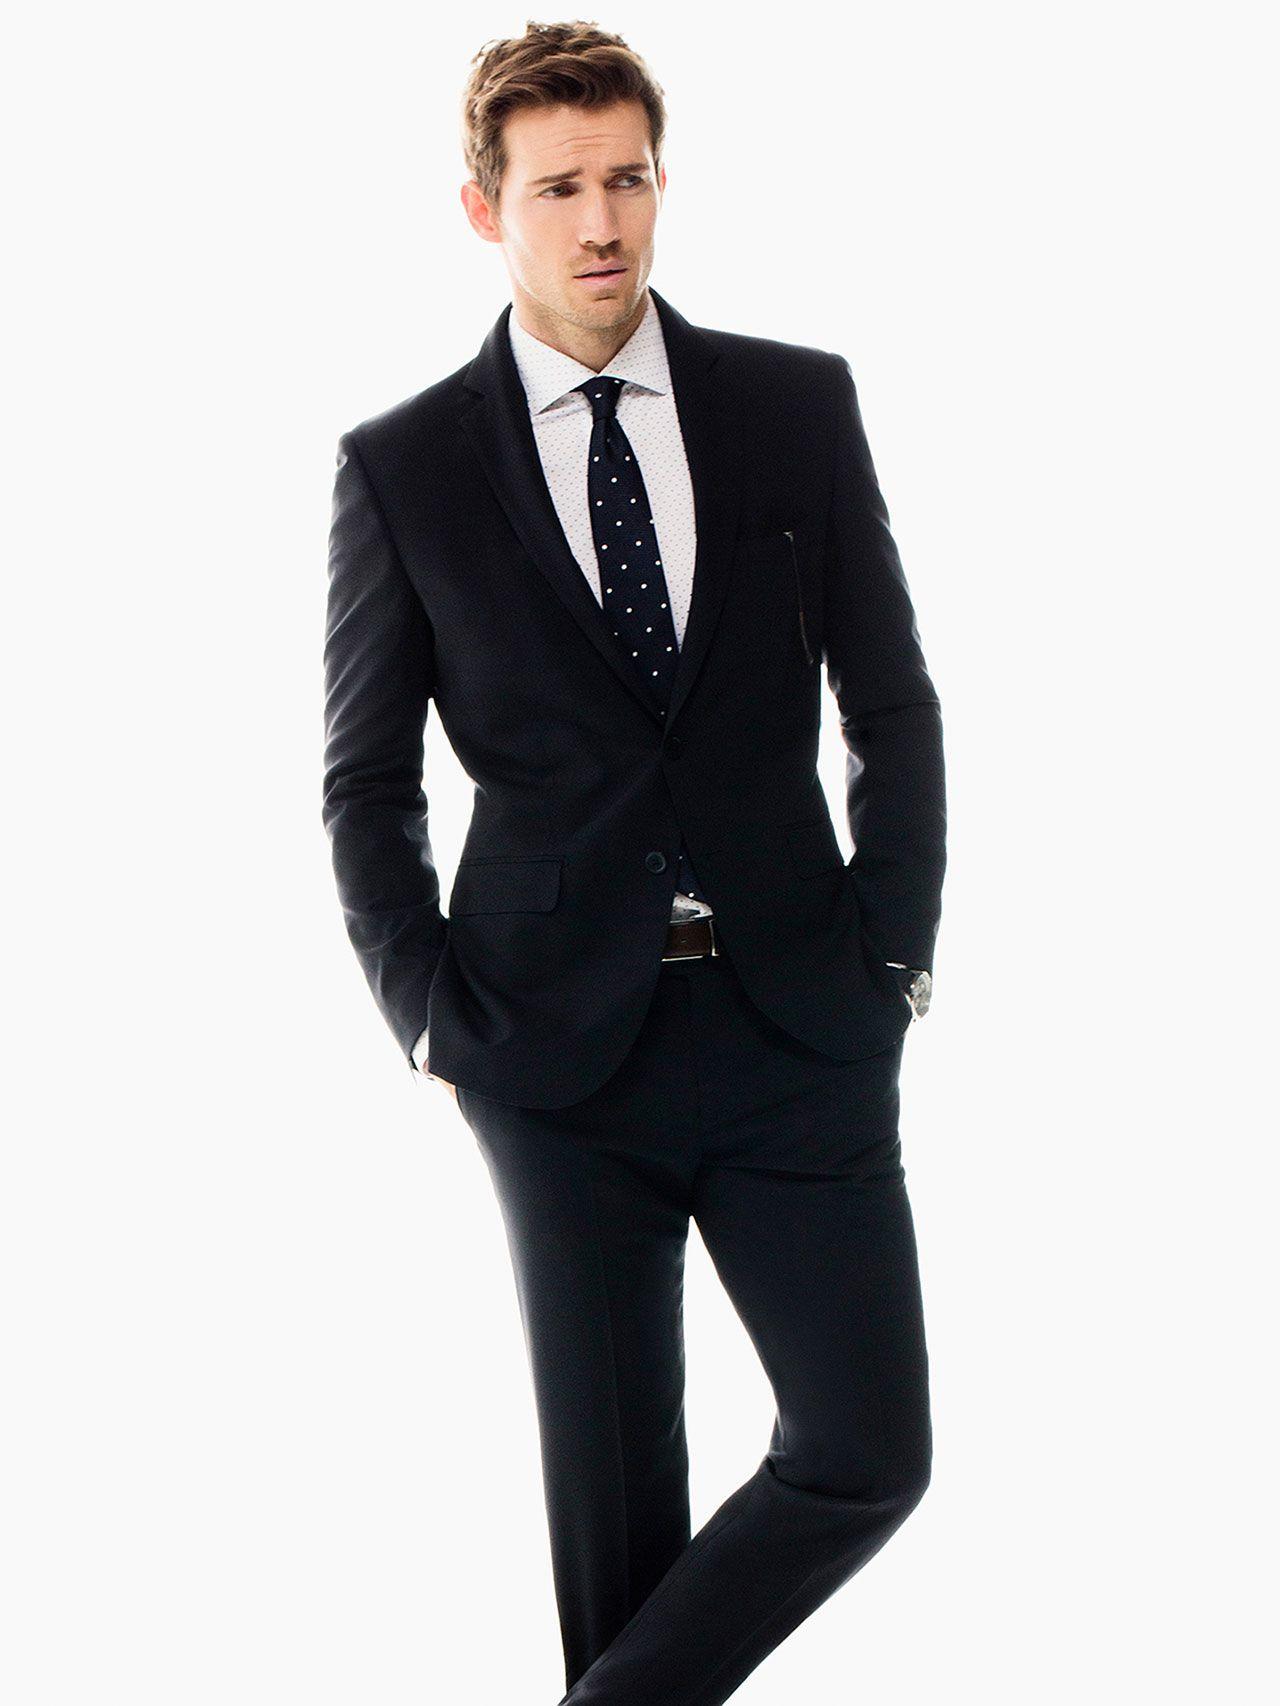 Massimo Dutti Slim Fit Italian Wool Suit Mid Rise Slim Leg Estilo De Hombre Trajes Traje De Novio